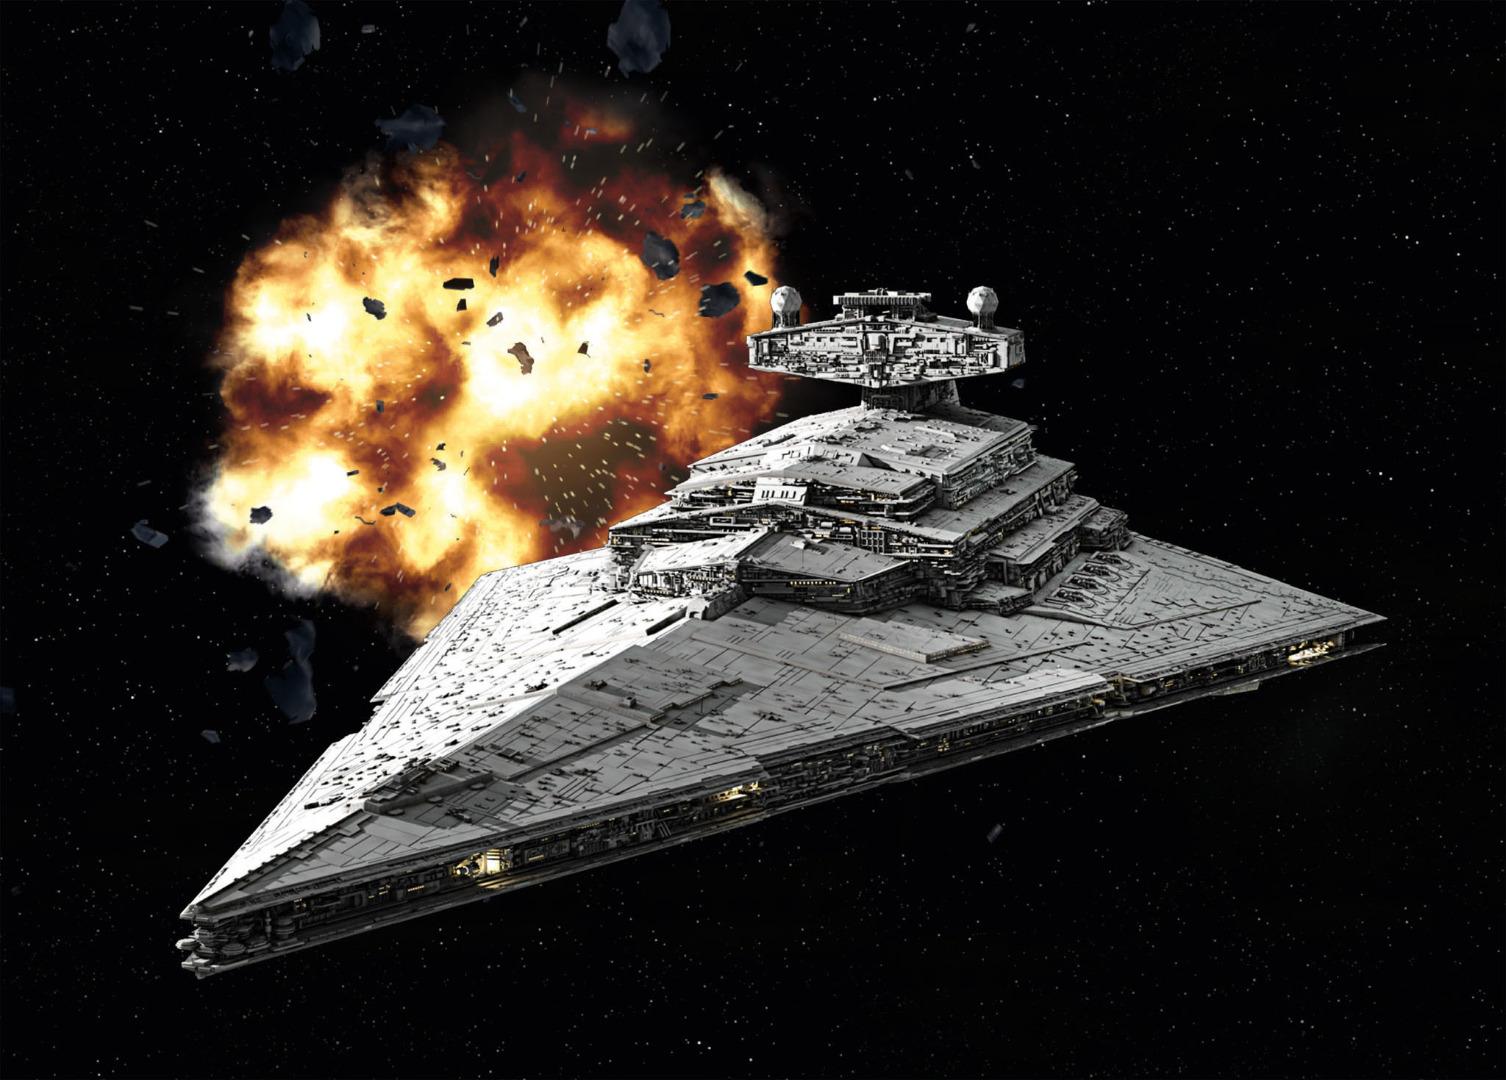 Revell Model Kit Star Wars Imperial Star Destroyer Scale: 1:12300